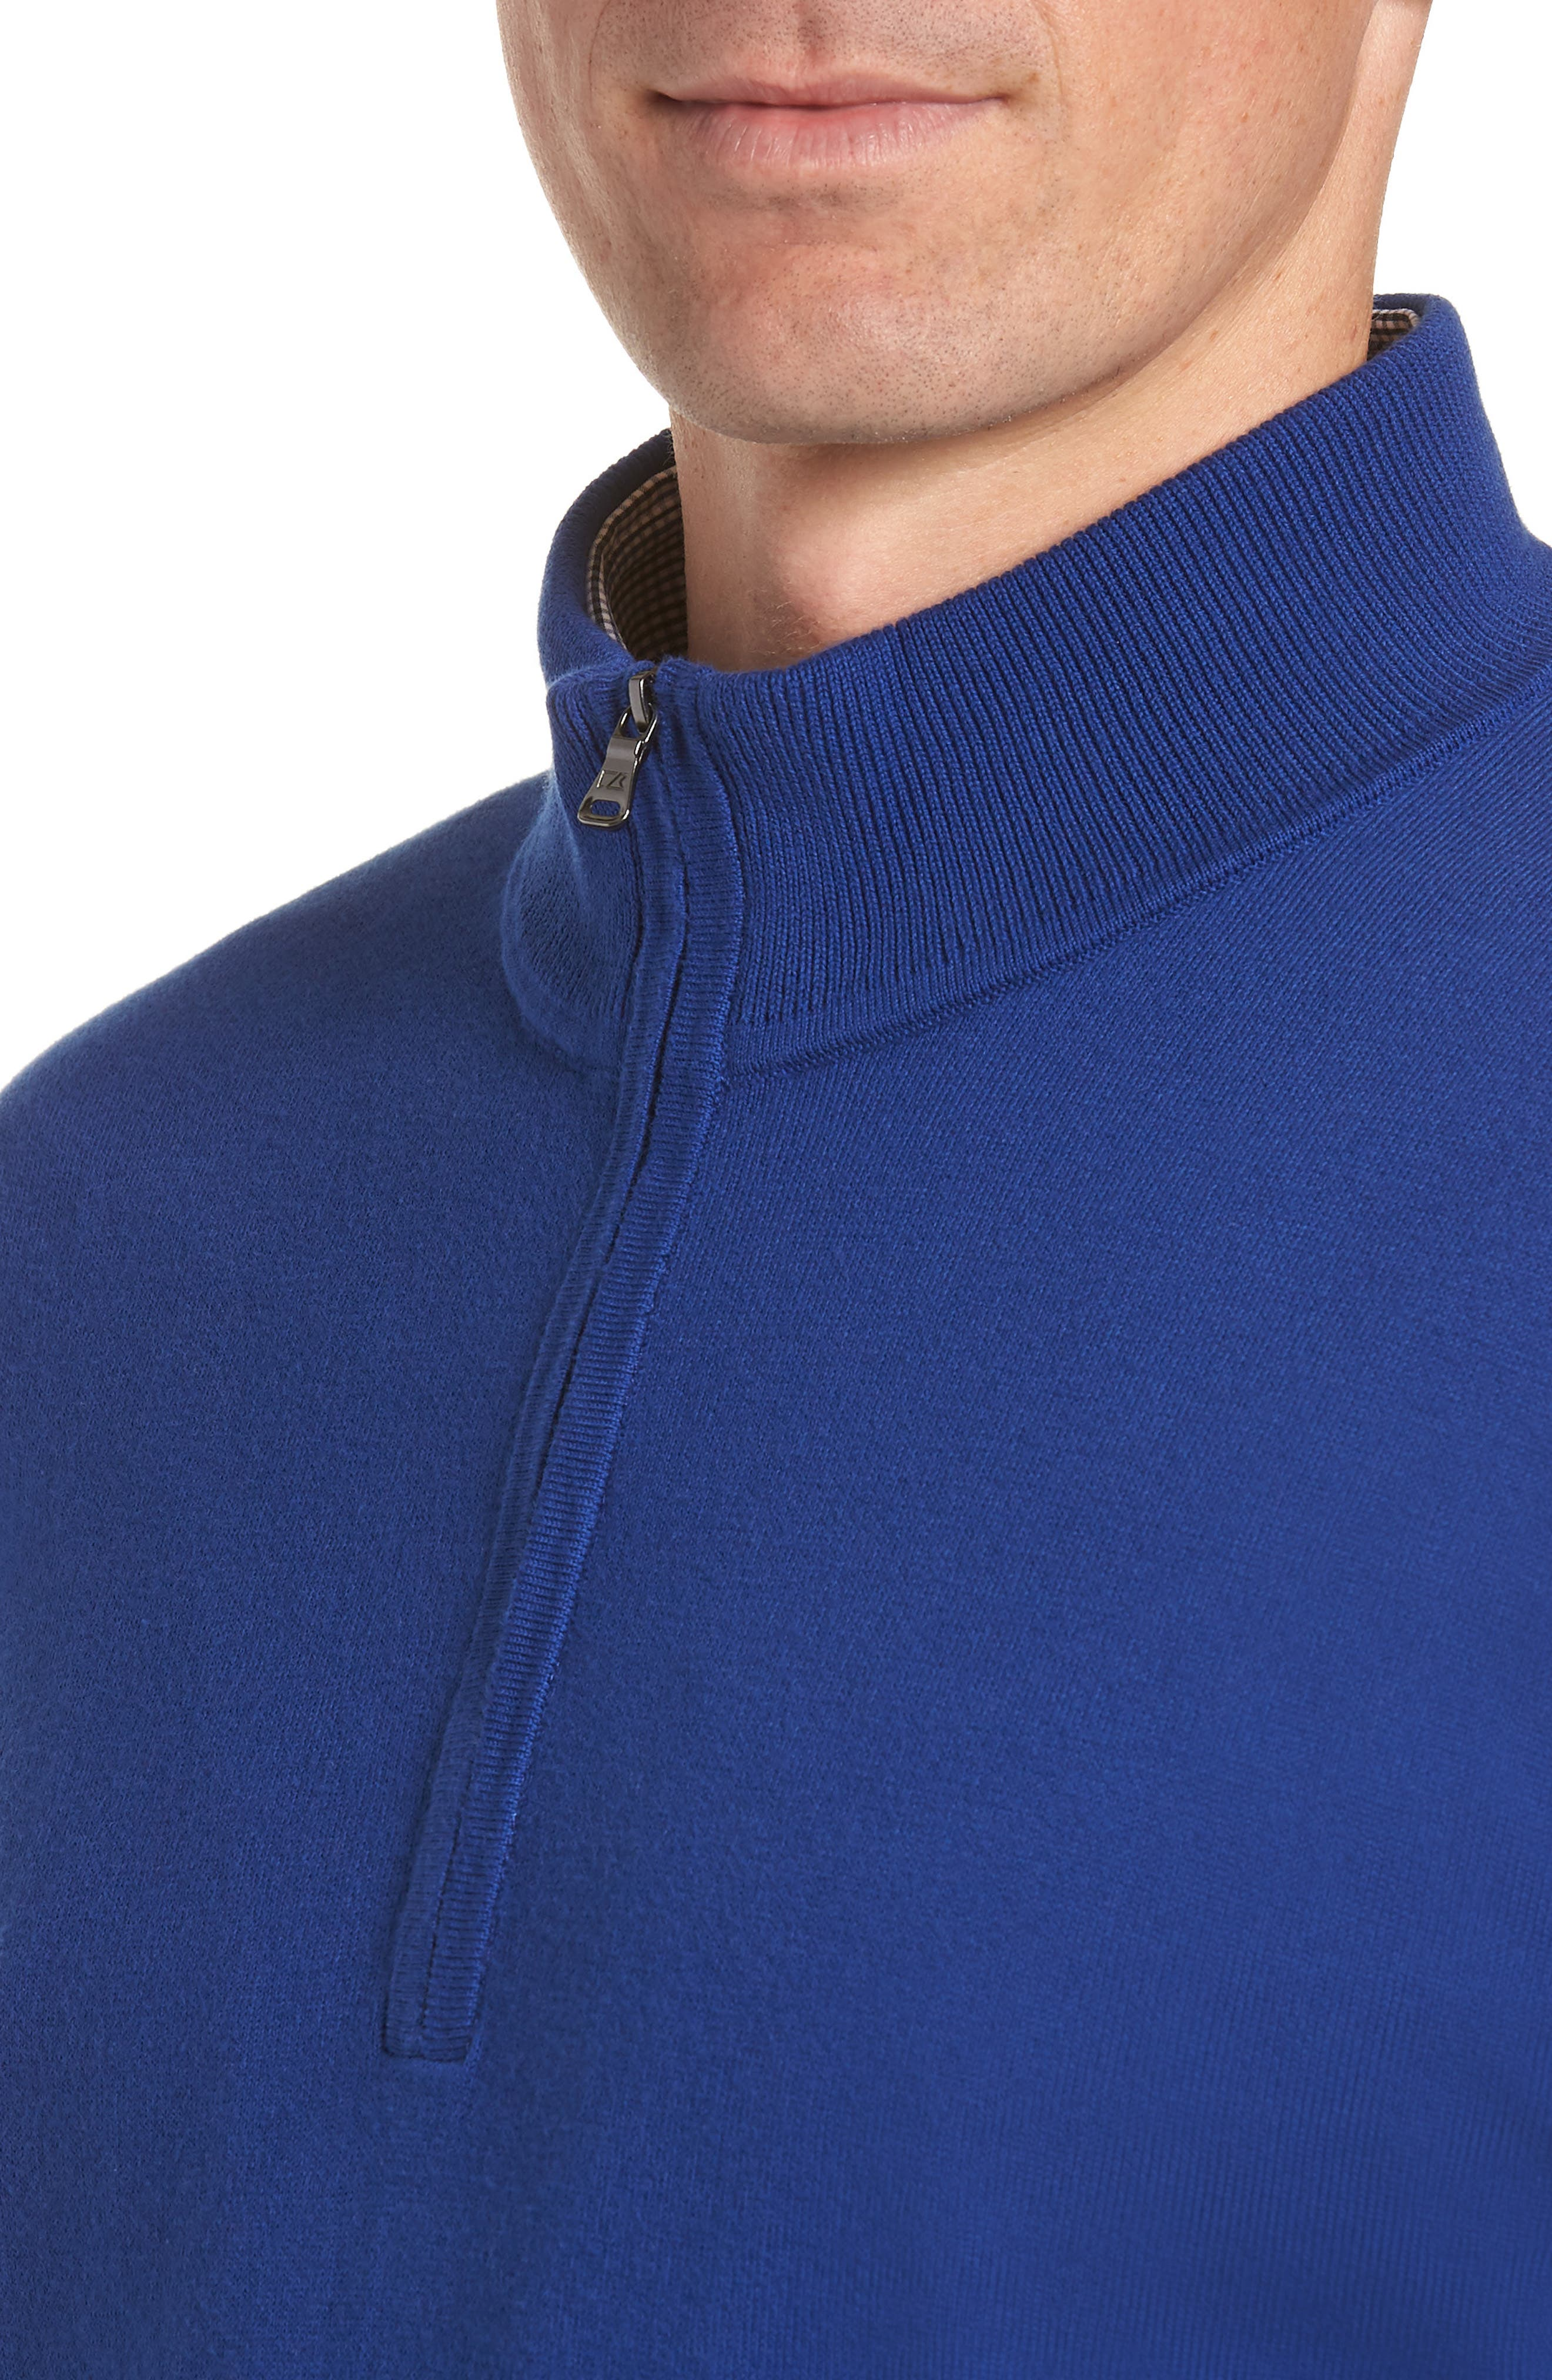 Lakemont Half Zip Sweater,                             Alternate thumbnail 4, color,                             BOLT